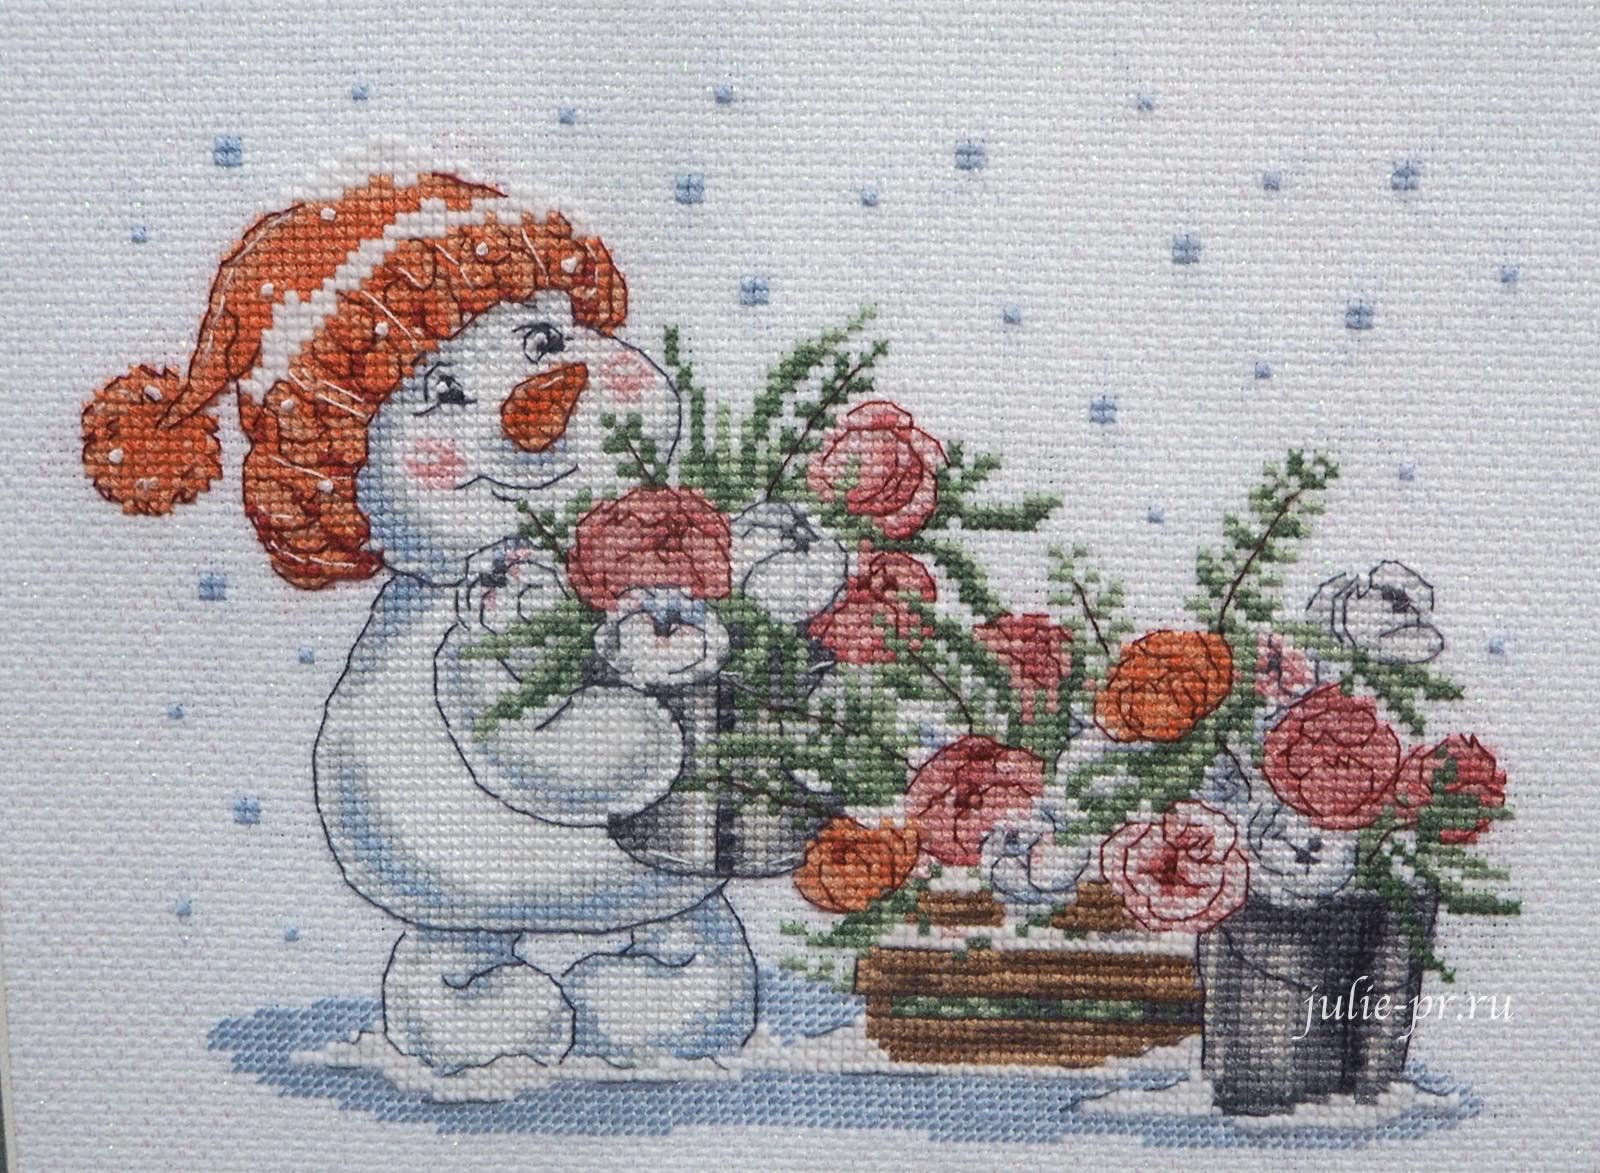 Кларт, снеговик с розами, Зима в розовом цвете, вышивка крестом, формула рукоделия зима 2020